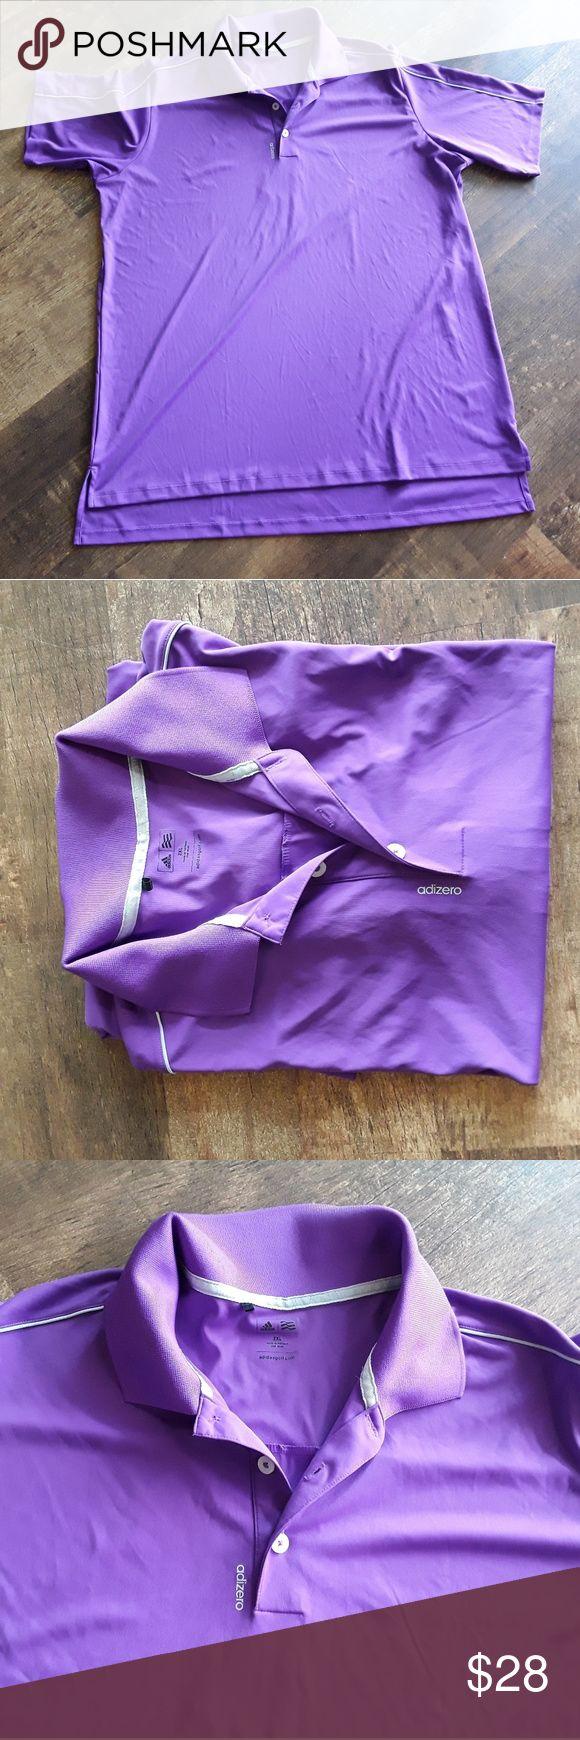 Adidas  golf aside to men performance polo shirts Purple polyester short sleeve polo. No holse. No spot. Non smoking house. Very nice color. adidas Shirts Polos